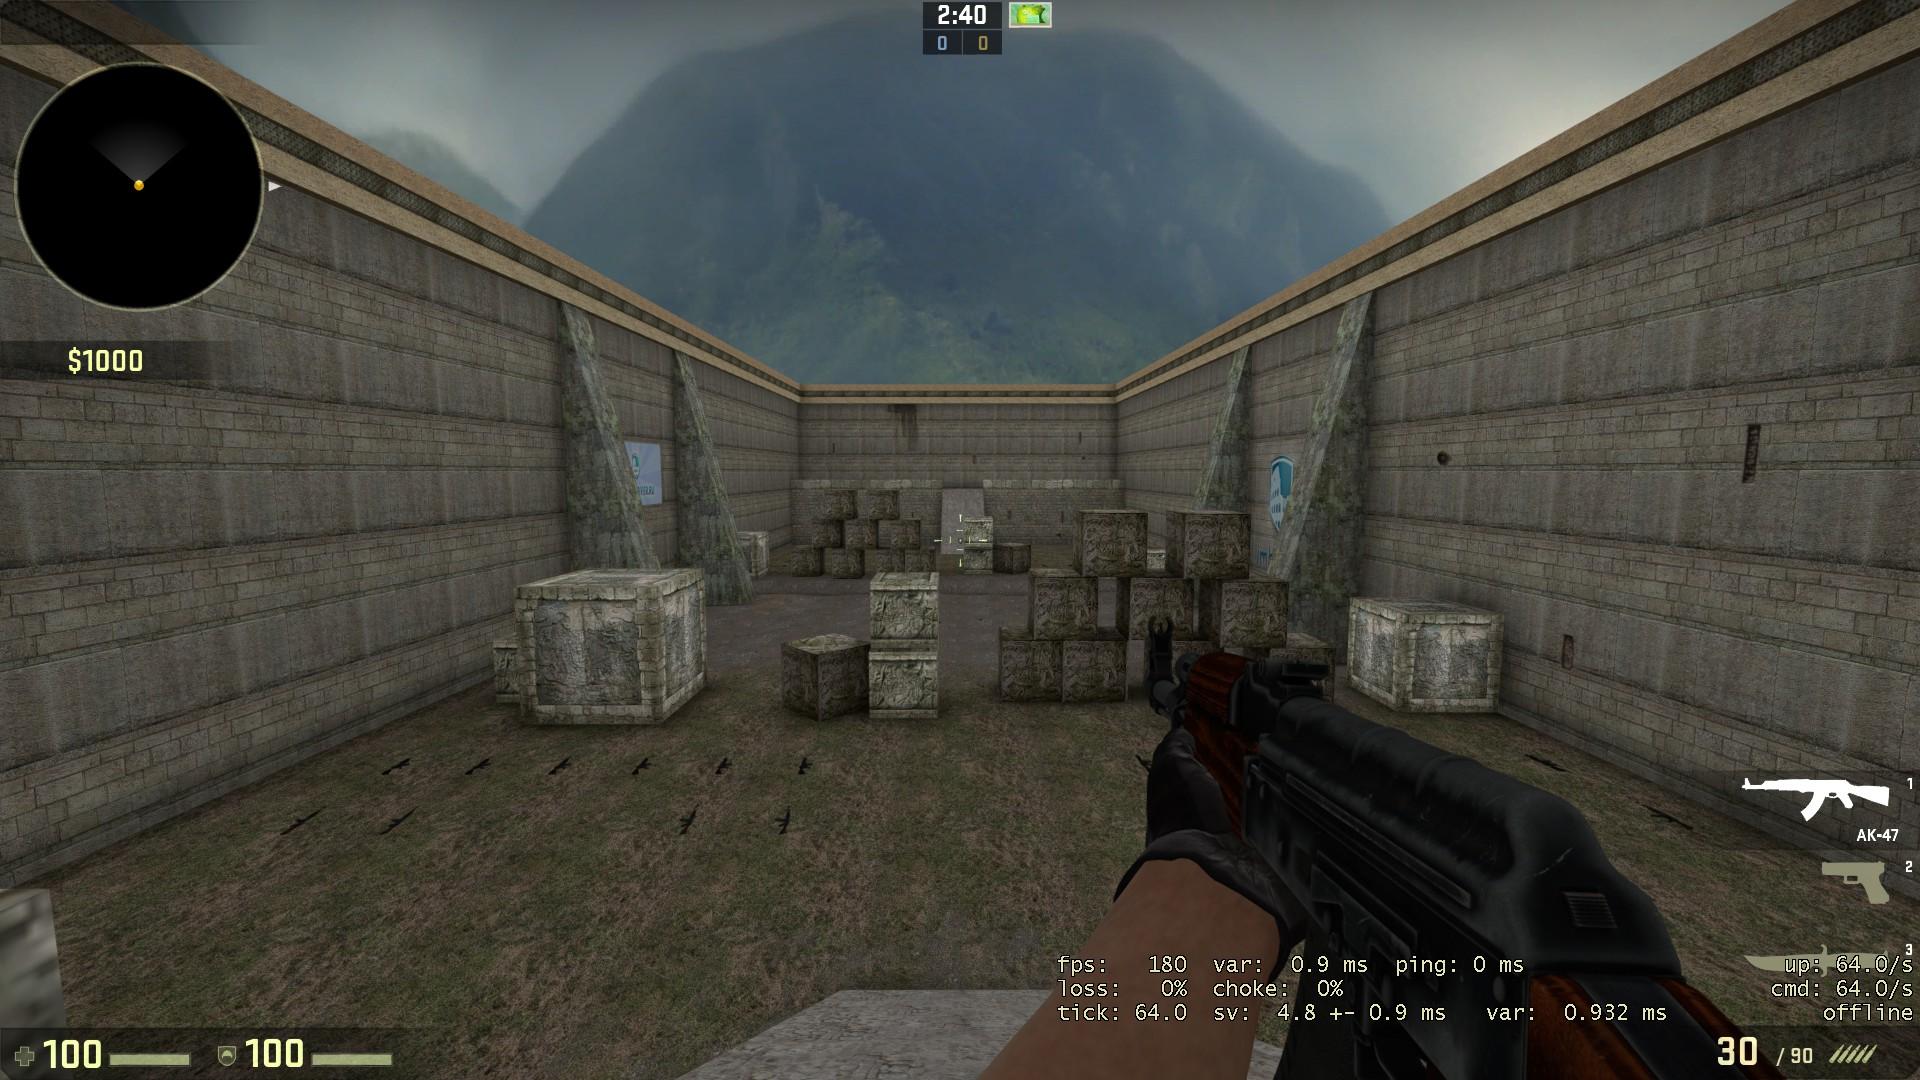 aim_headshot_imb